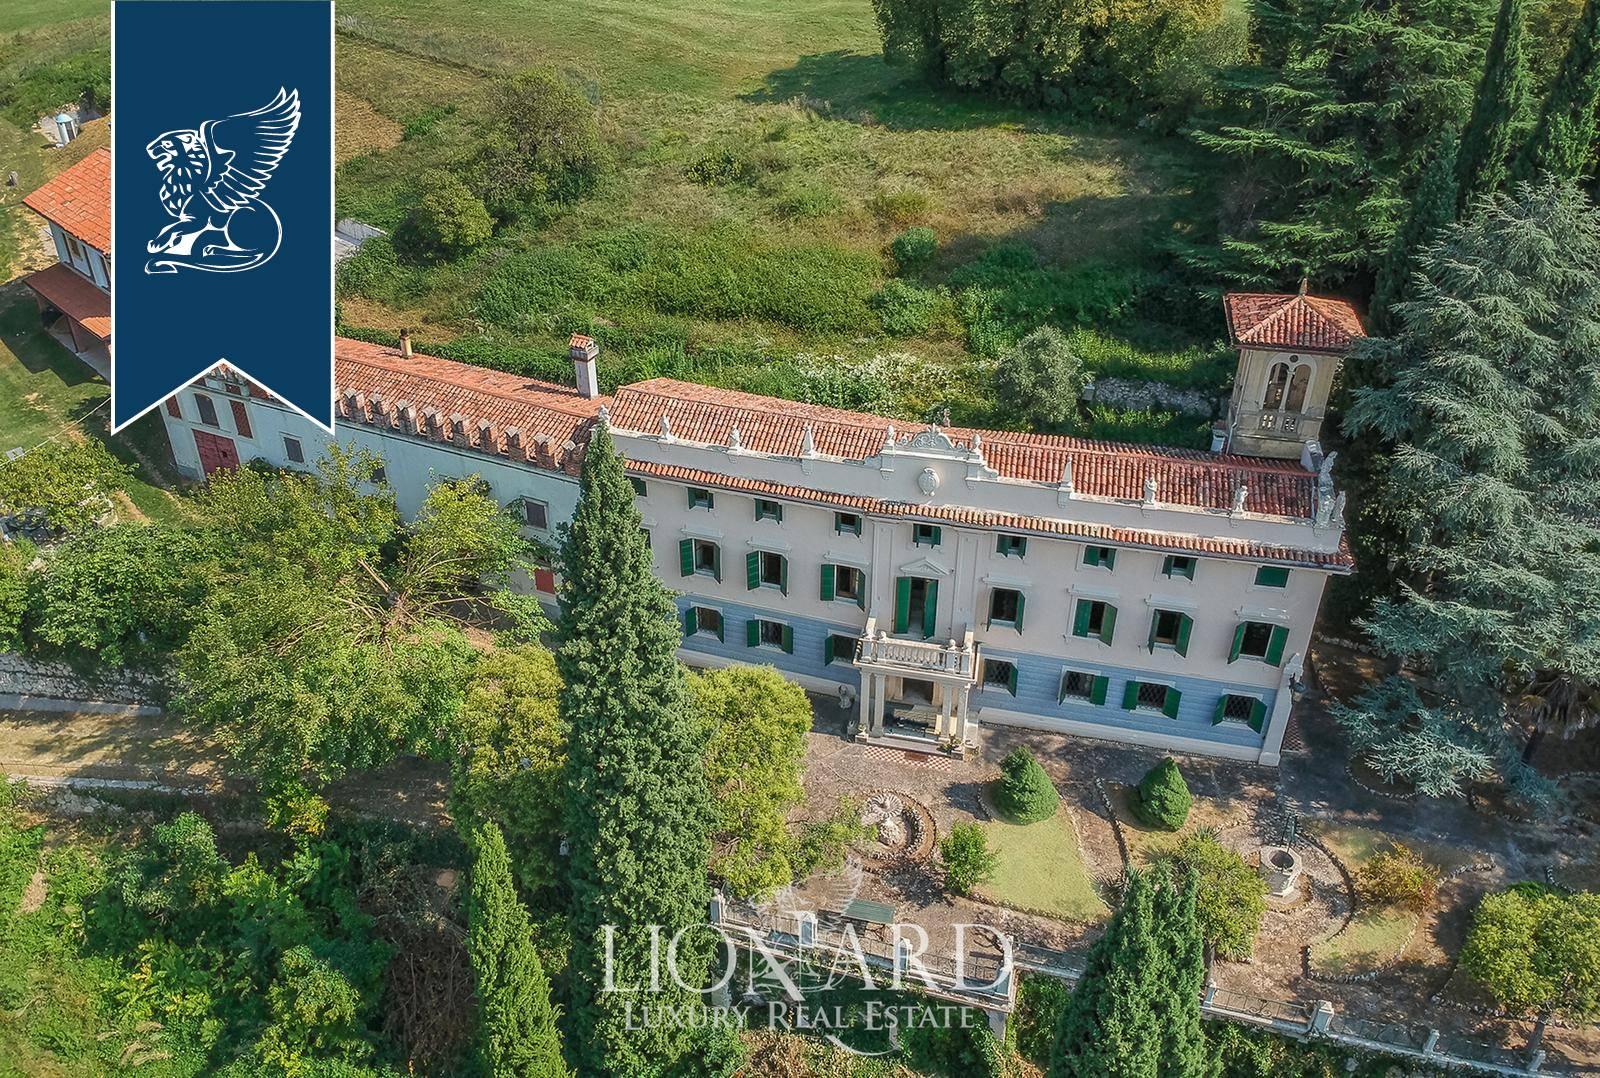 Villa in Vendita a Verona: 0 locali, 900 mq - Foto 9